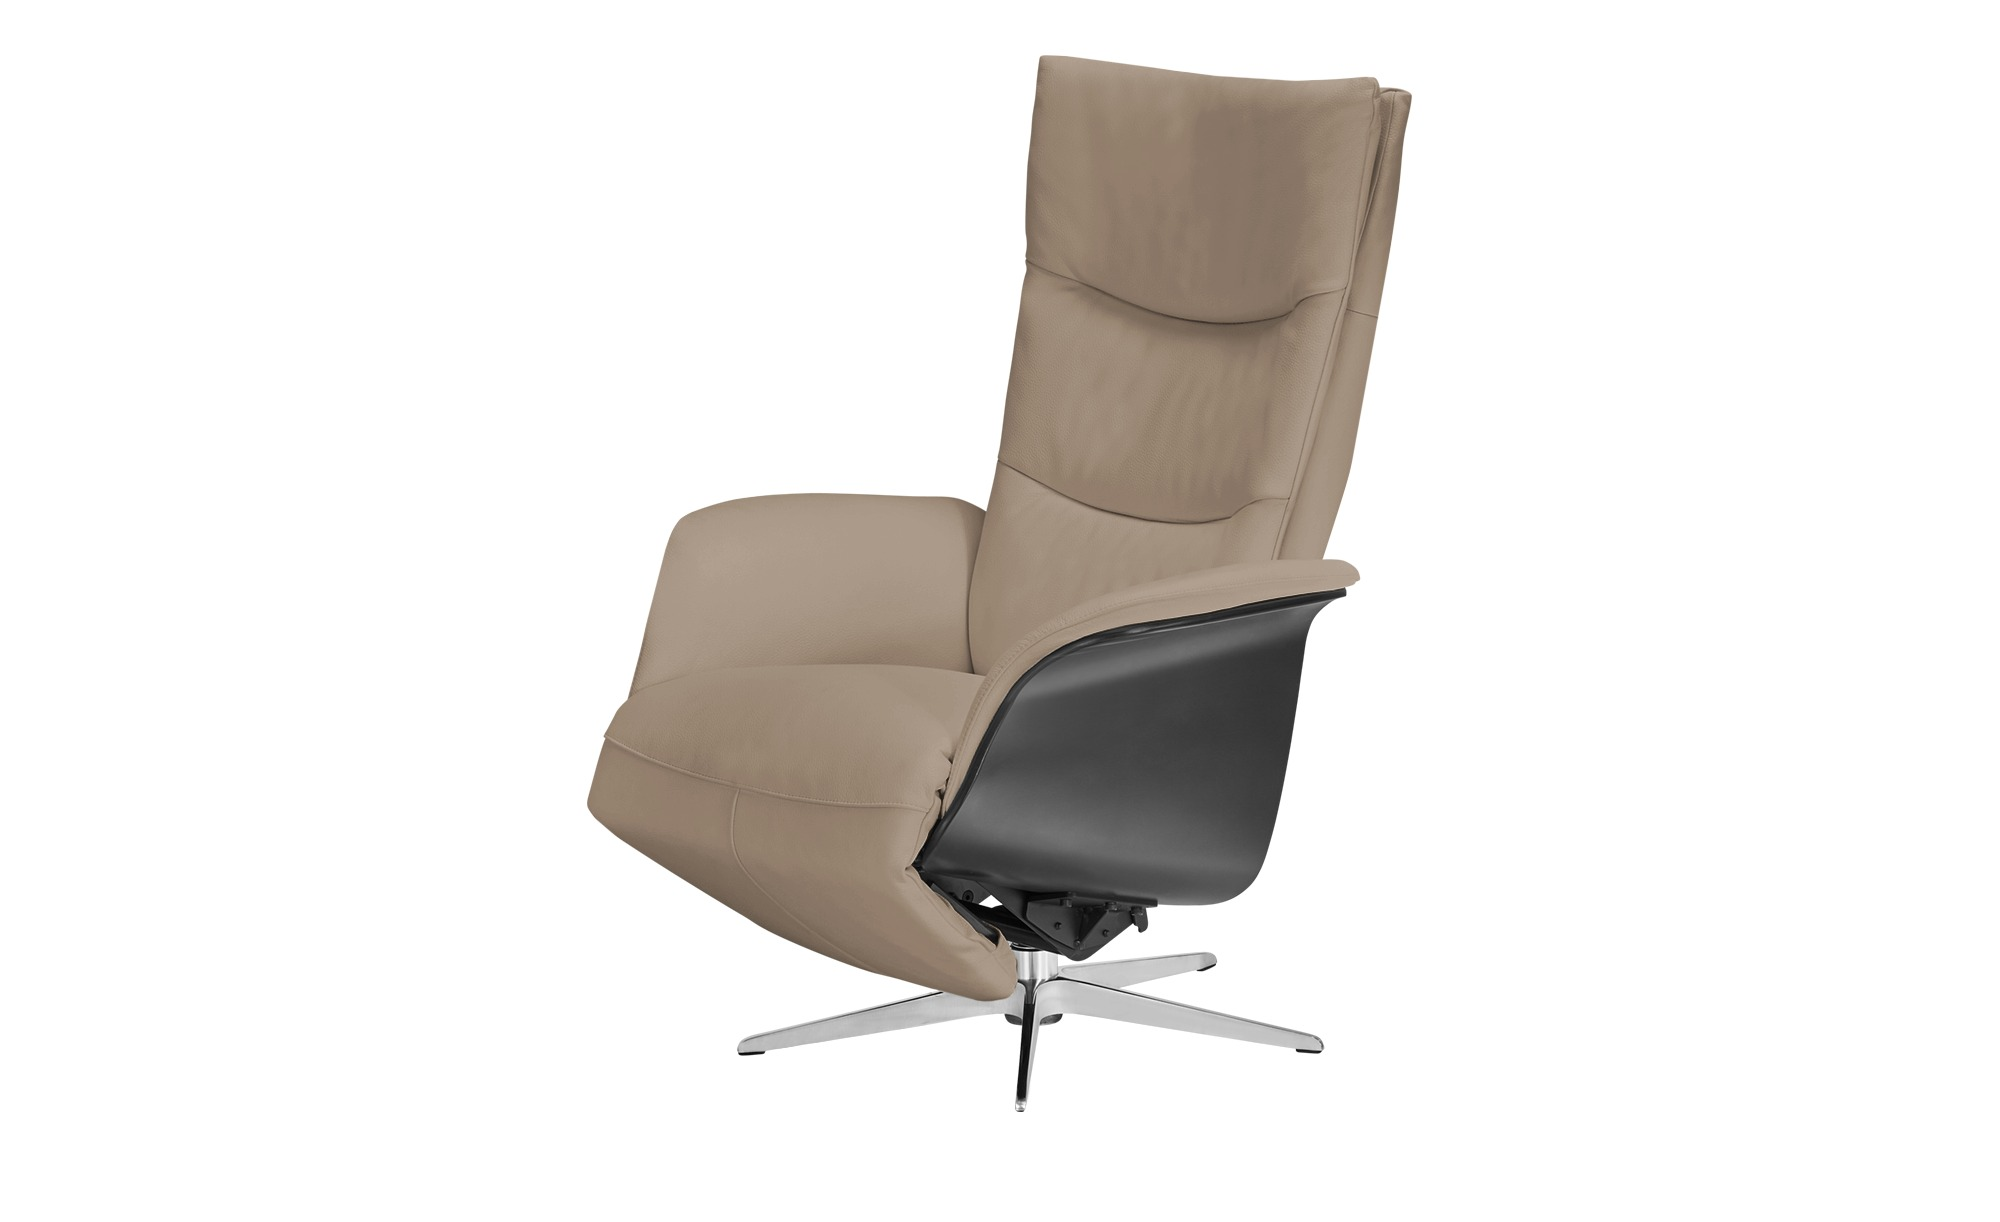 Relaxsessel beige - Leder Mika ¦ beige ¦ Maße (cm): B: 77 H: 109 T: 82 Polstermöbel > Sessel > Fernsehsessel - Höffner